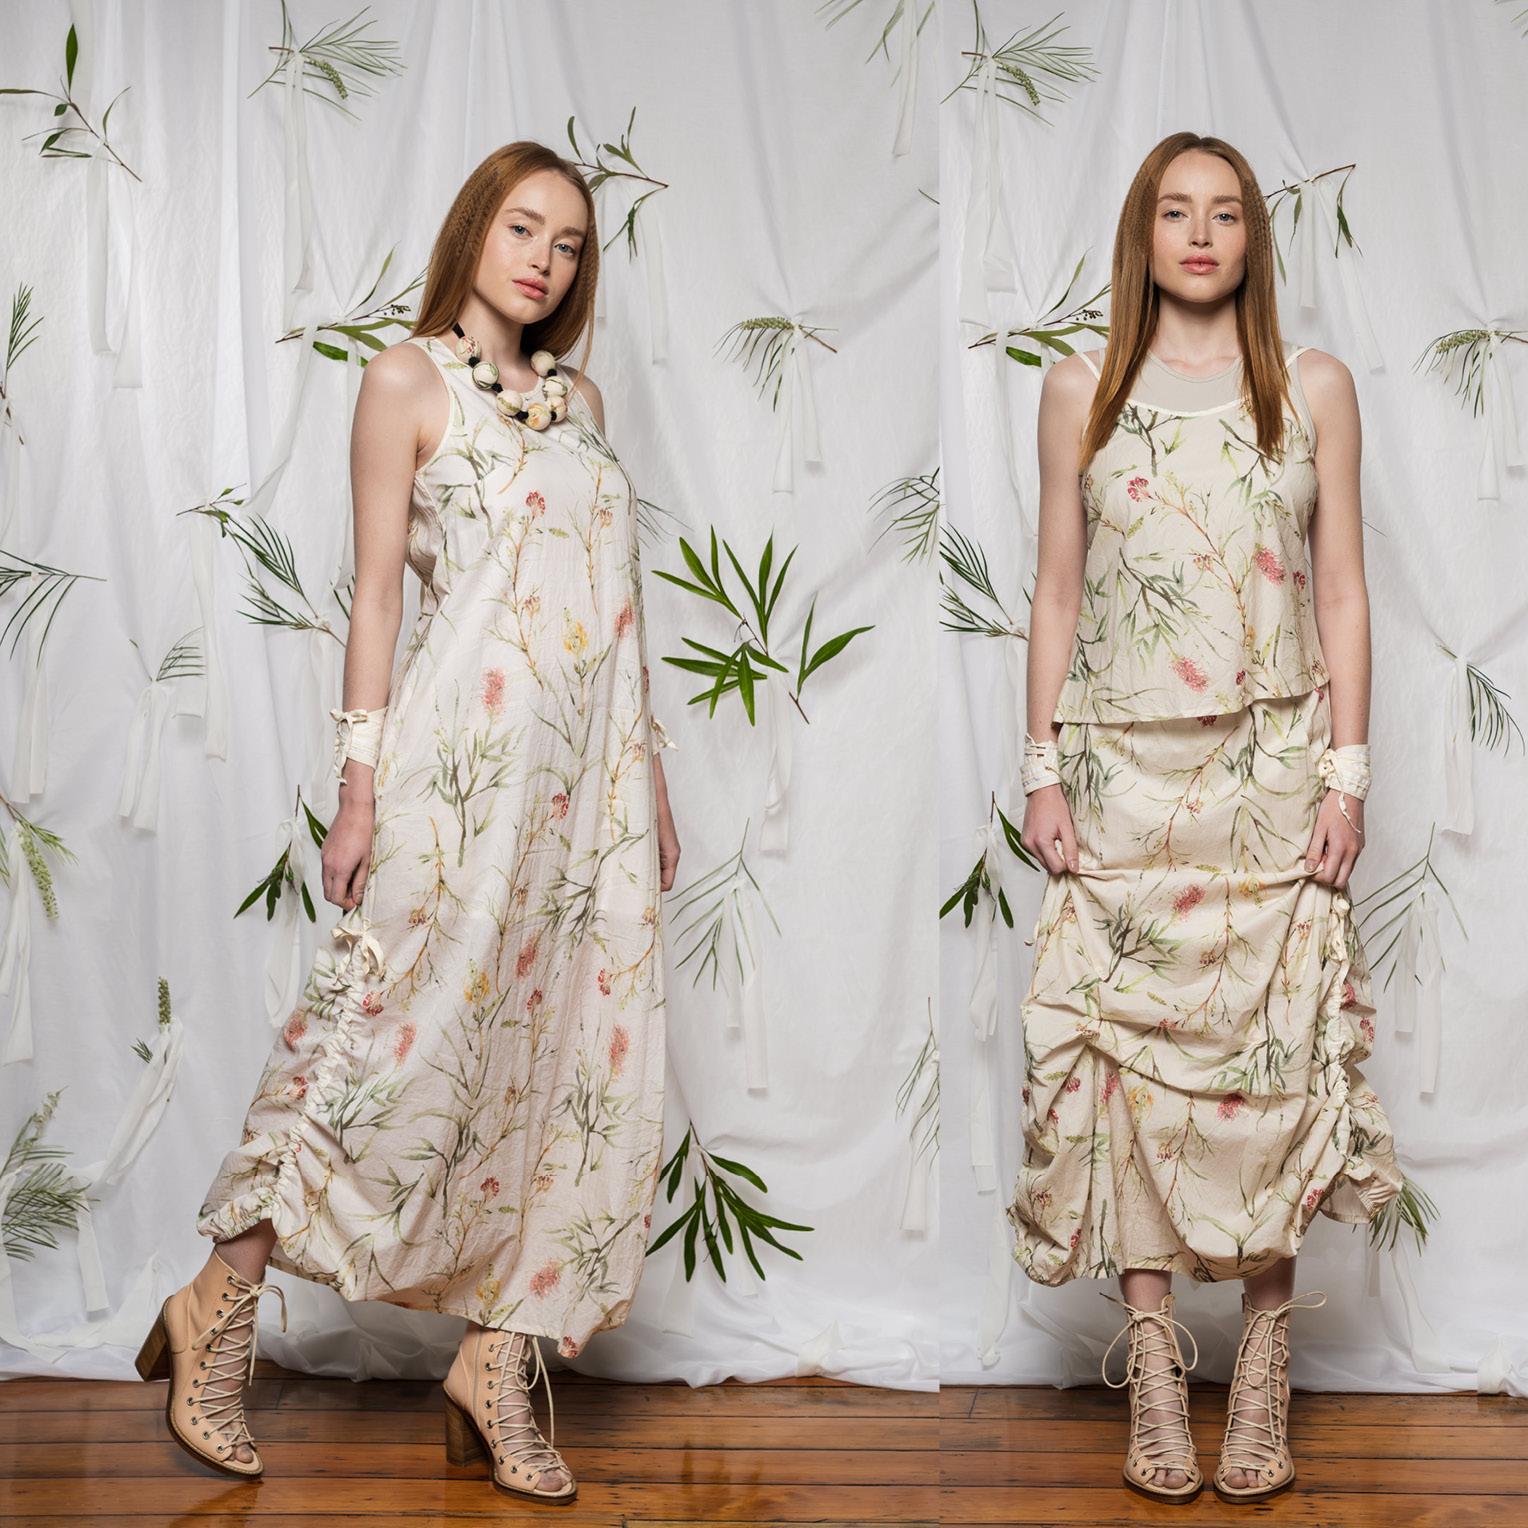 LEFT: Marmalade Dress  RIGHT: Esker Top, Obsidian Top & Marmalade Skirt